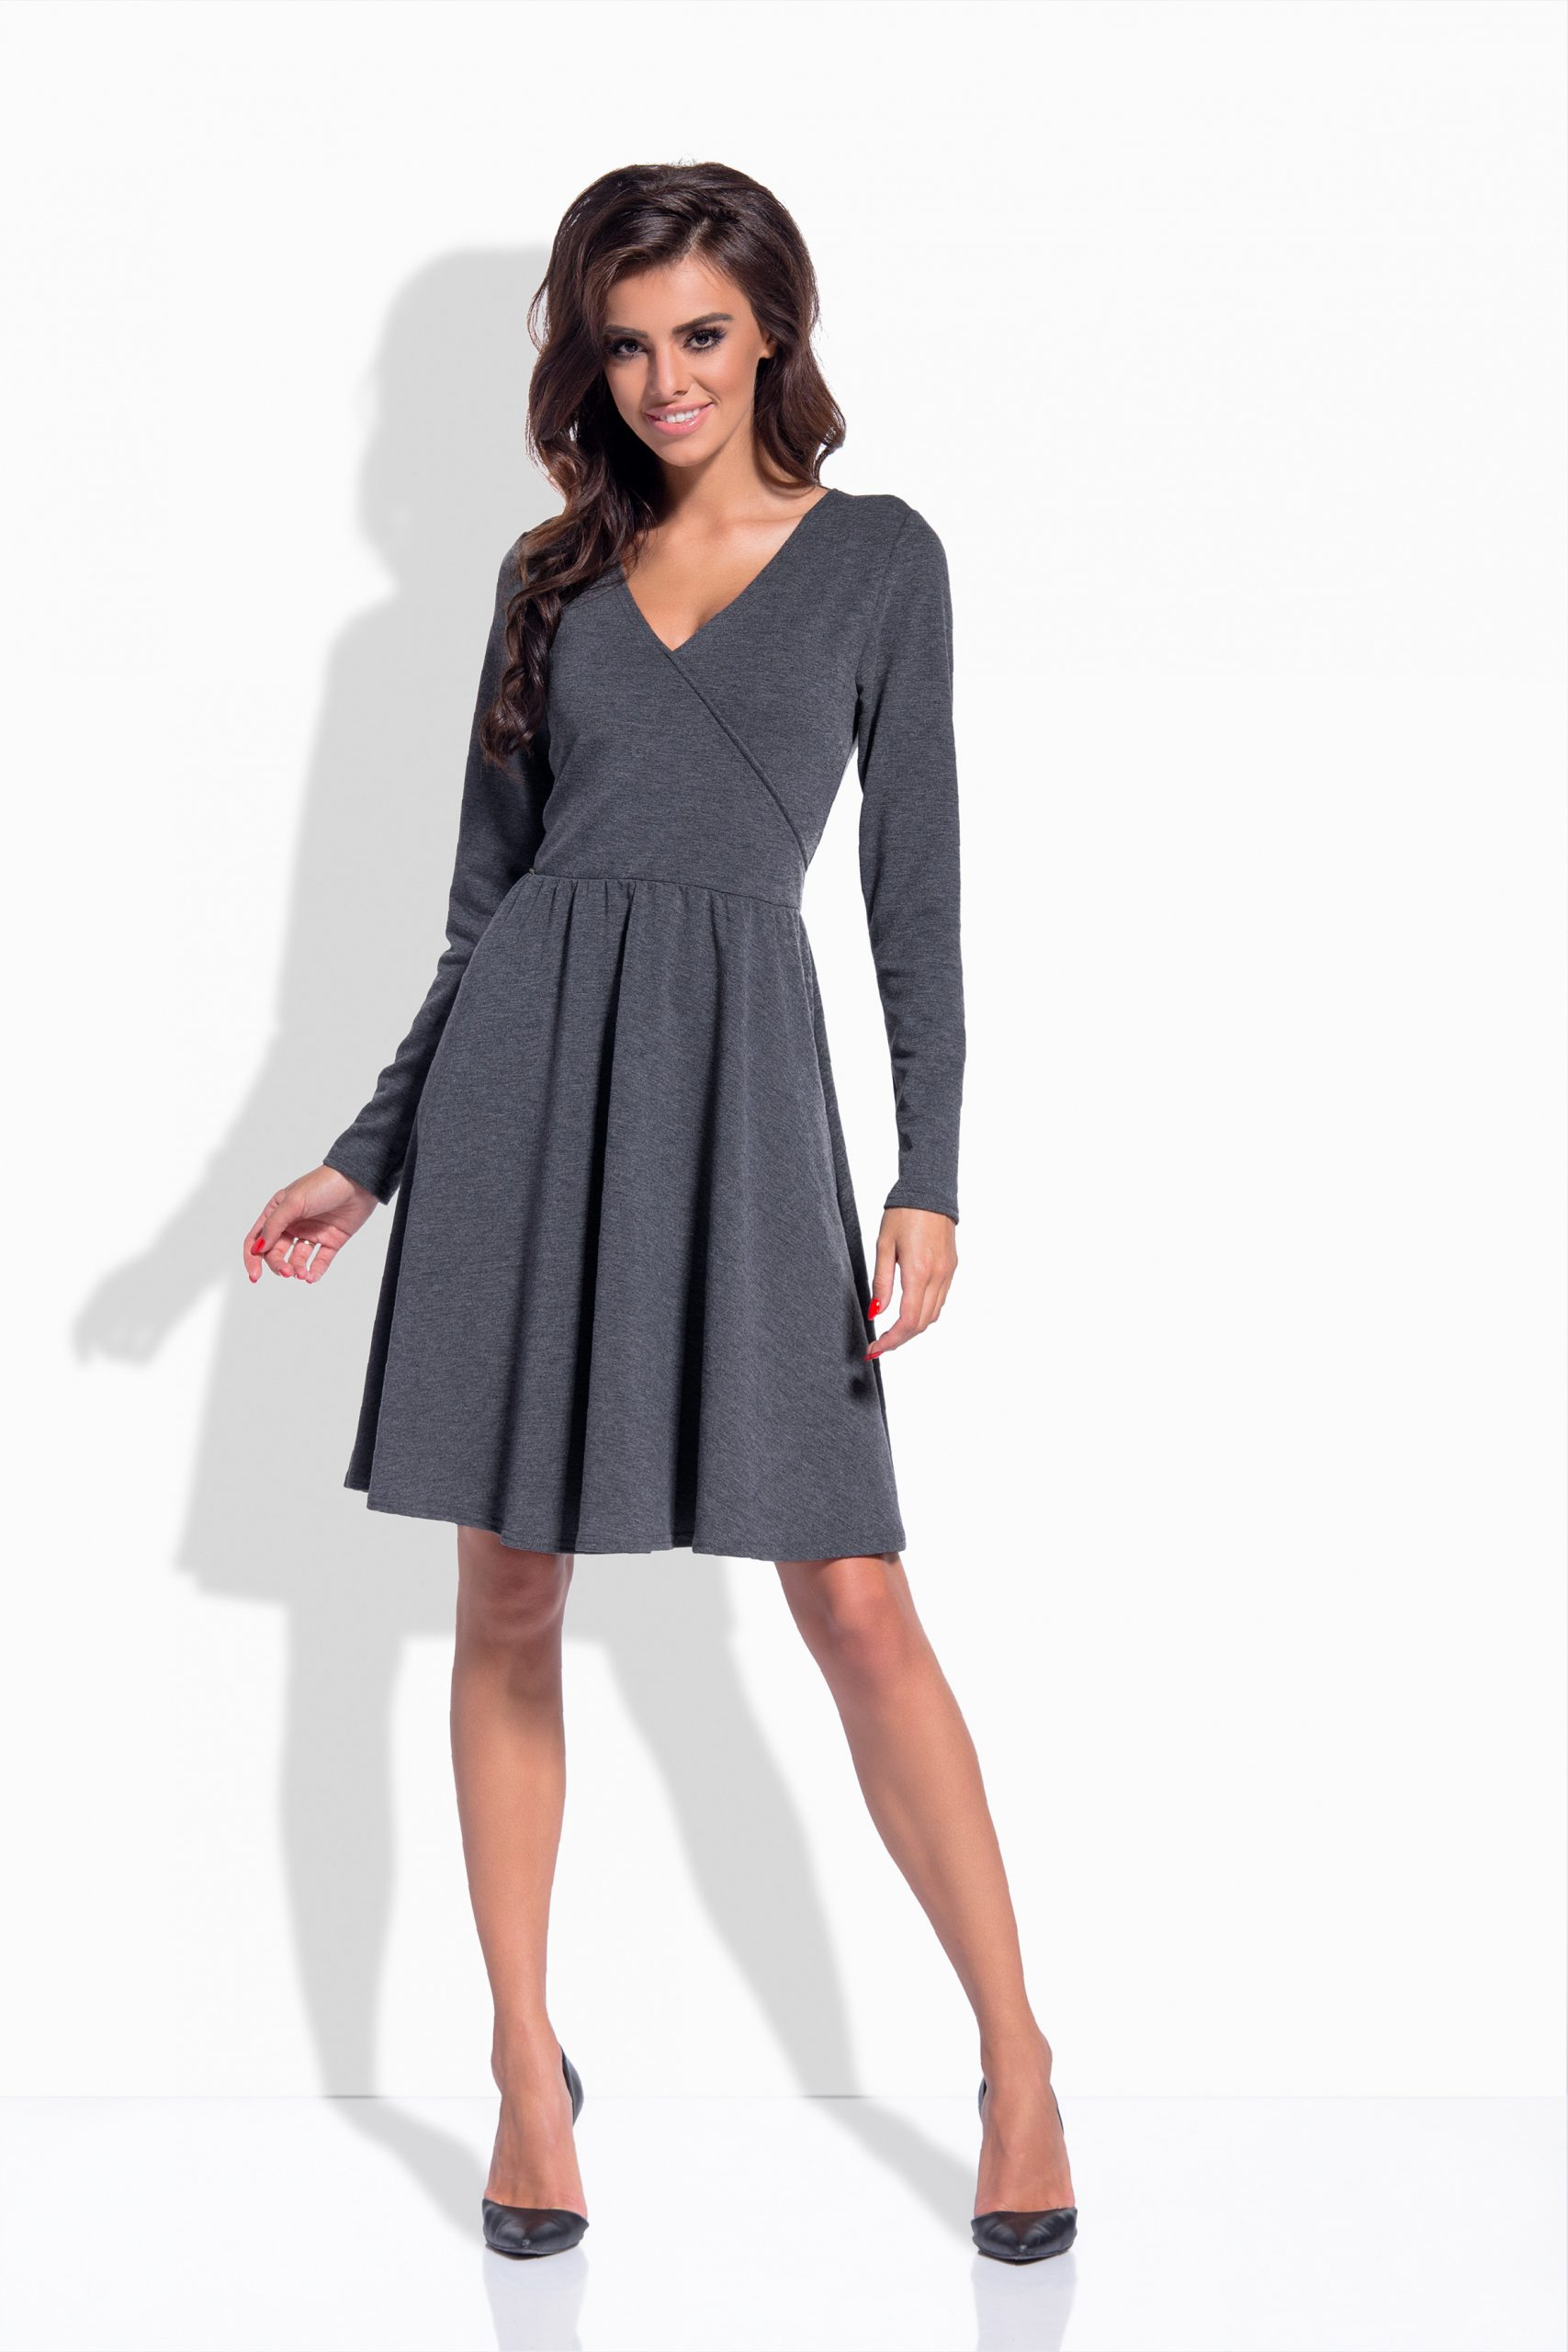 Neu Damen Midi Kleid Knielang Bleistiftkleid Langarm